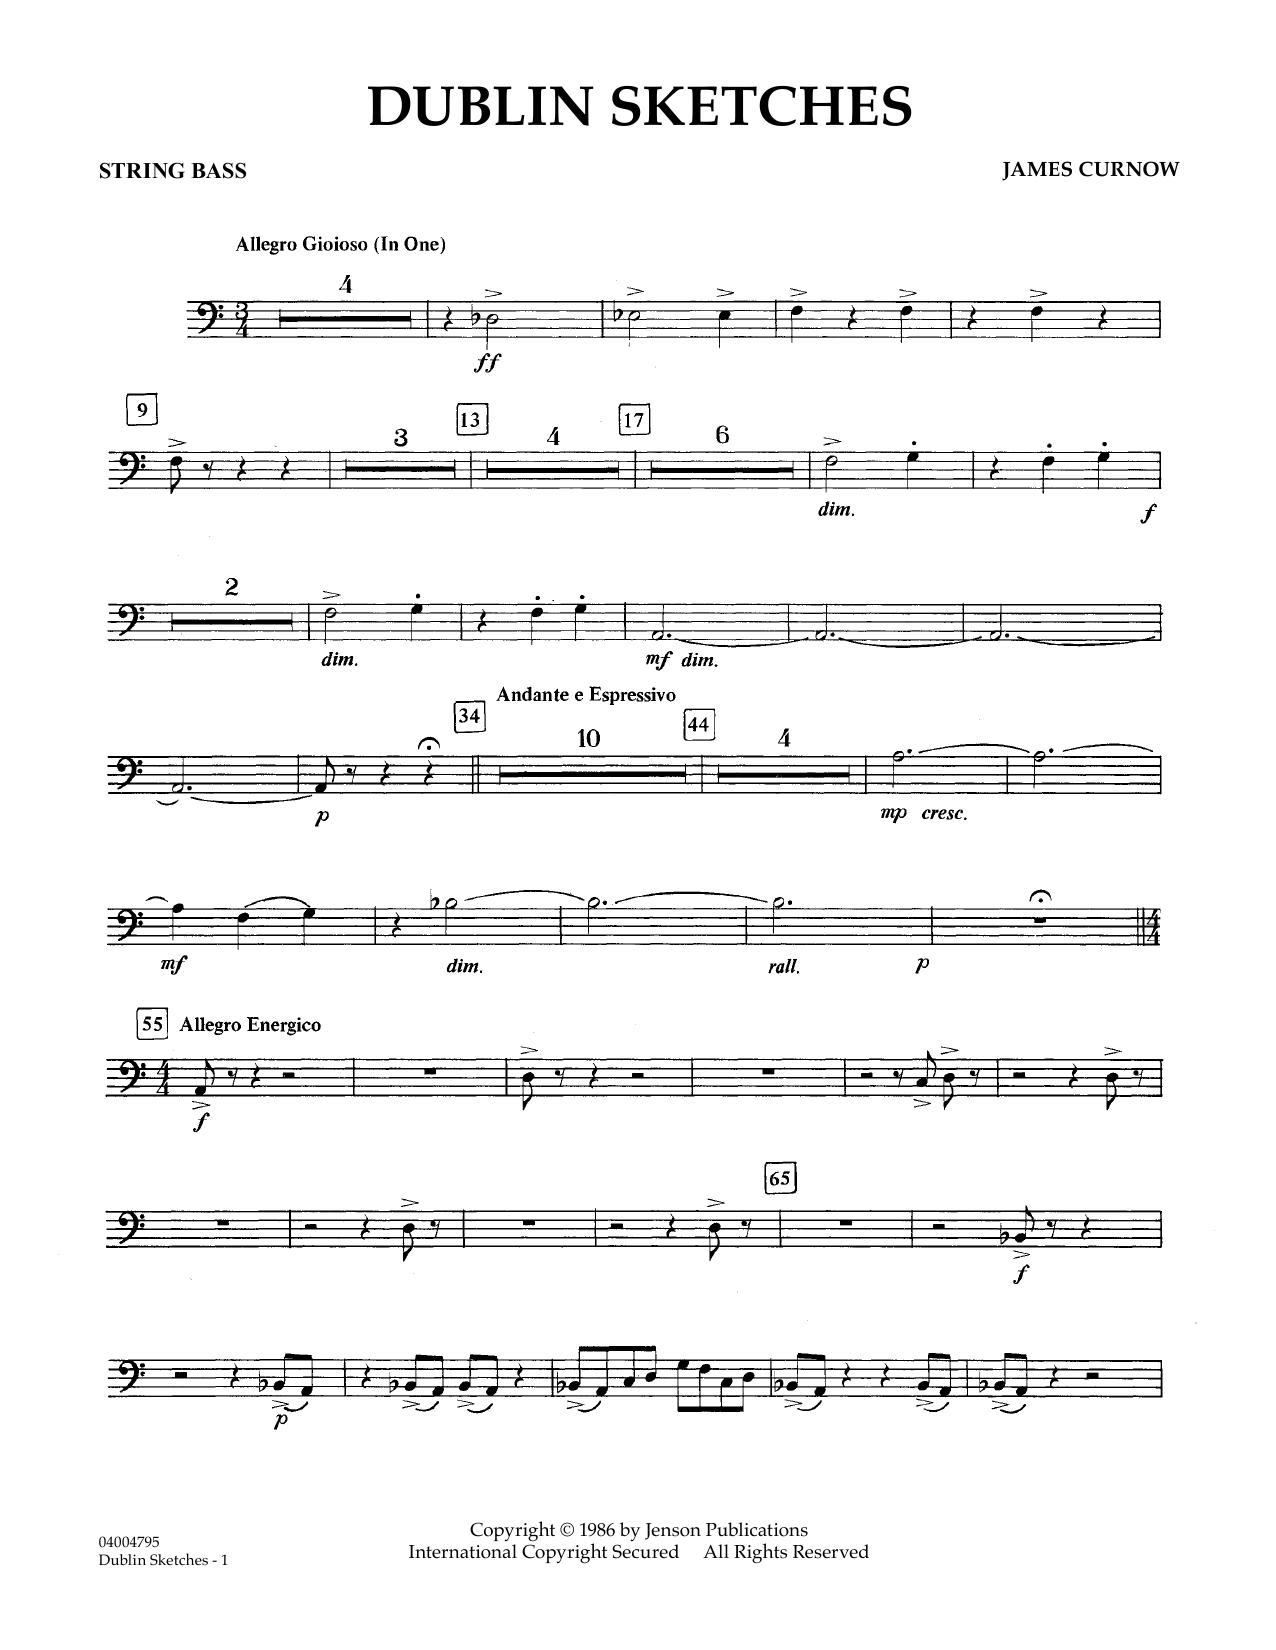 Dublin Sketches - String Bass (Concert Band)